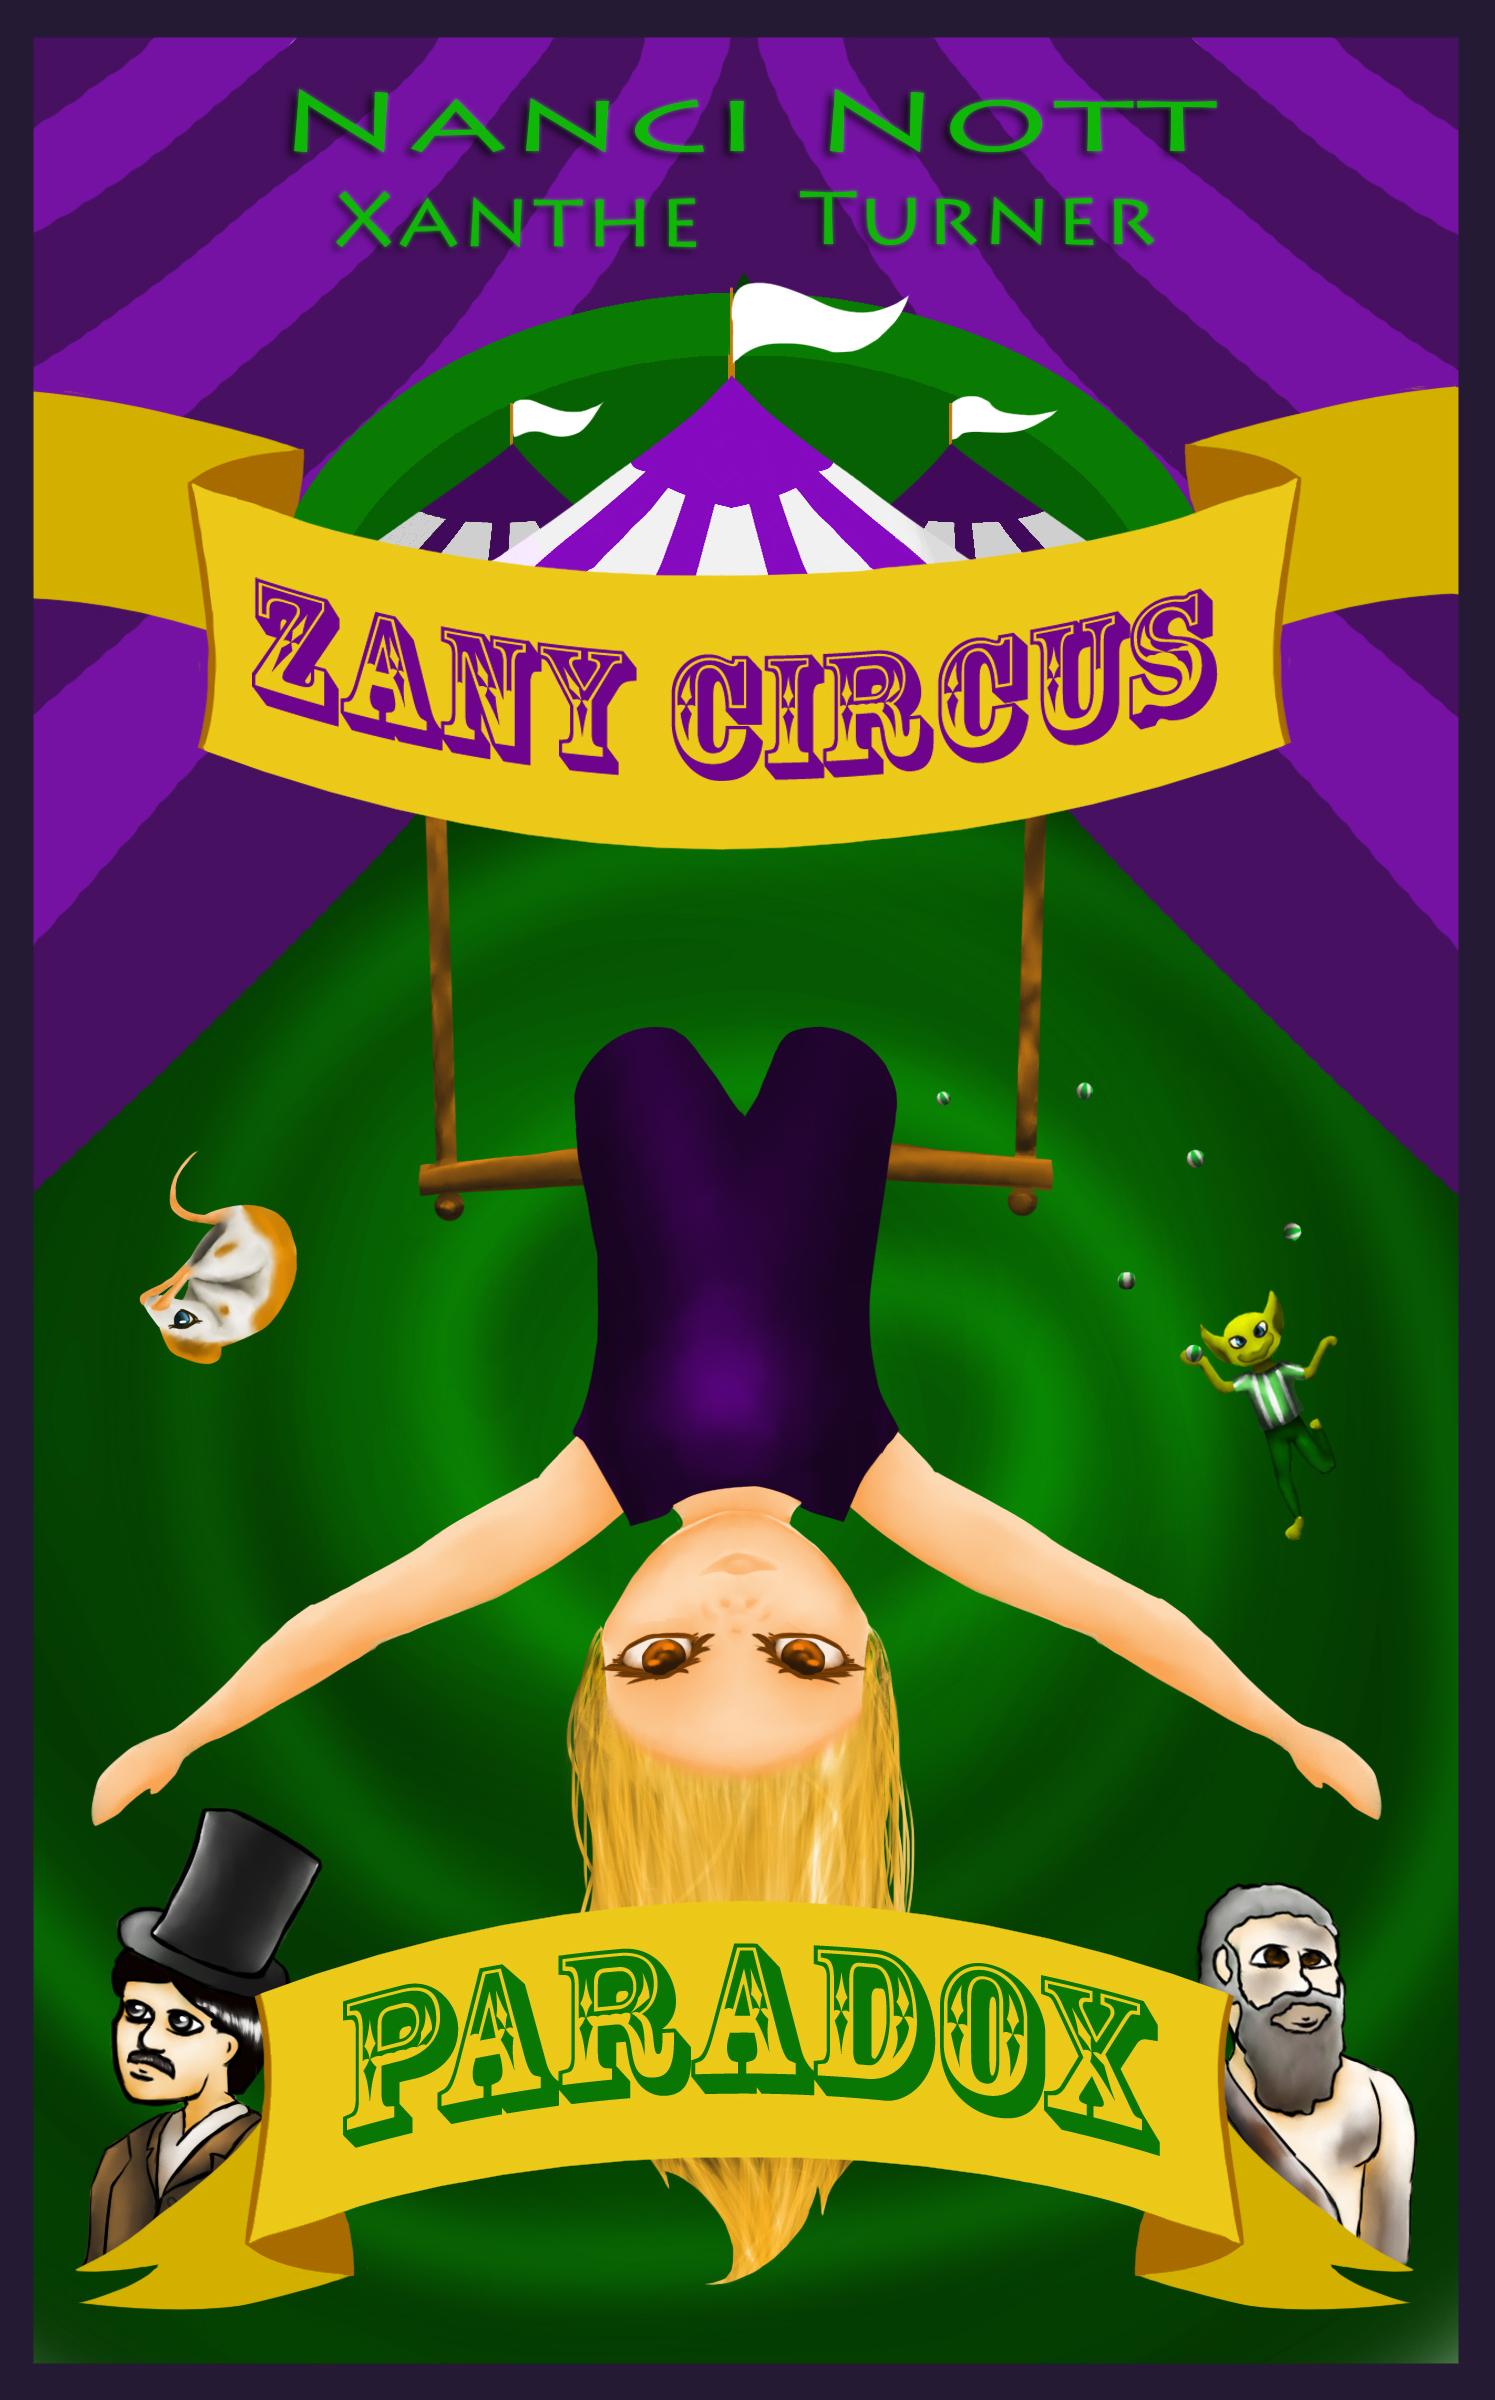 Zany Circus: Paradox by Nanci Nott and Xanthe Turner